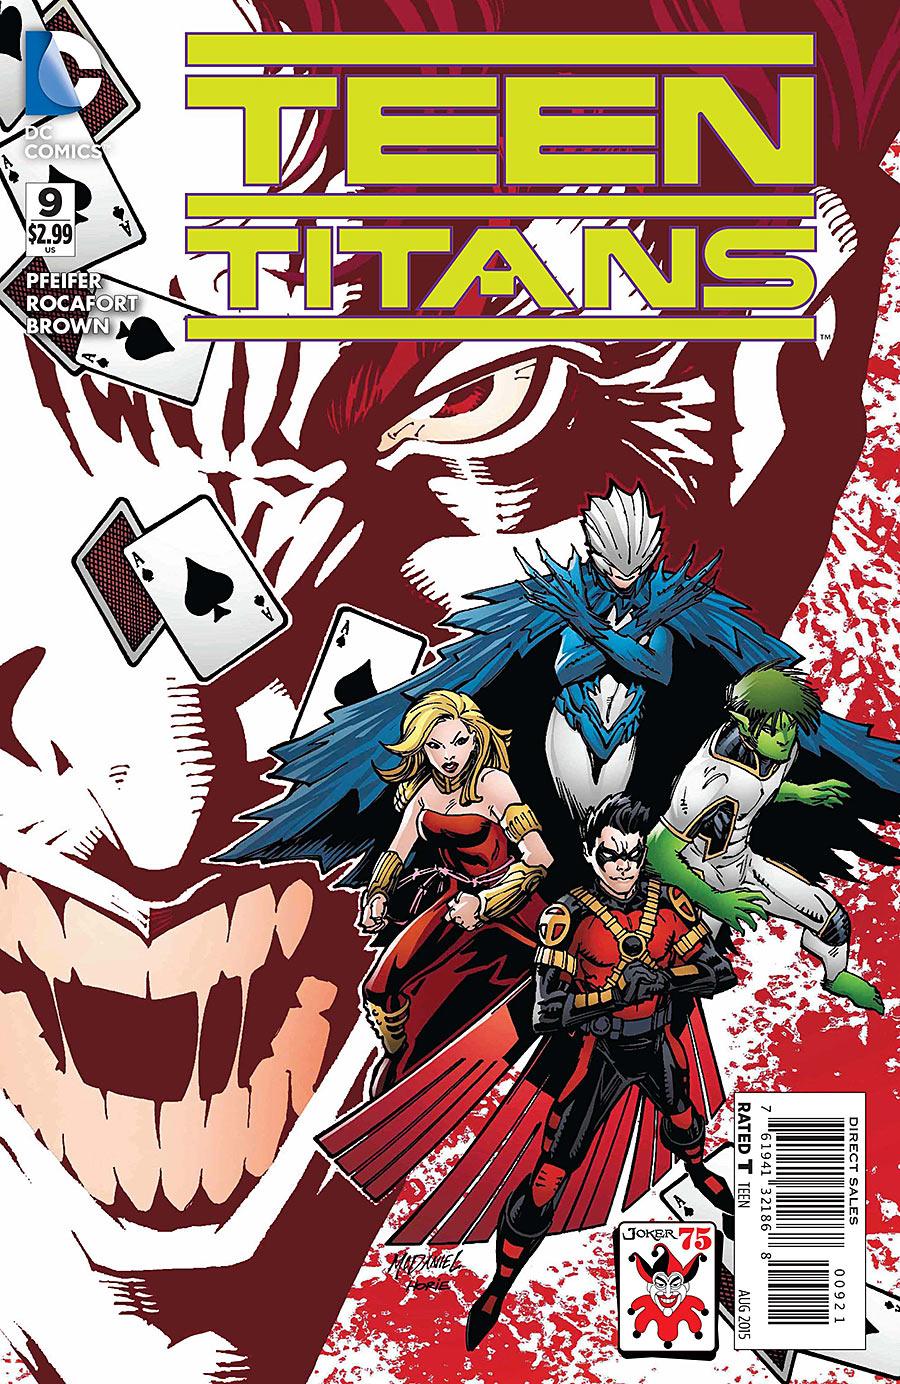 Teen Titans Vol 5 9 Variant.jpg